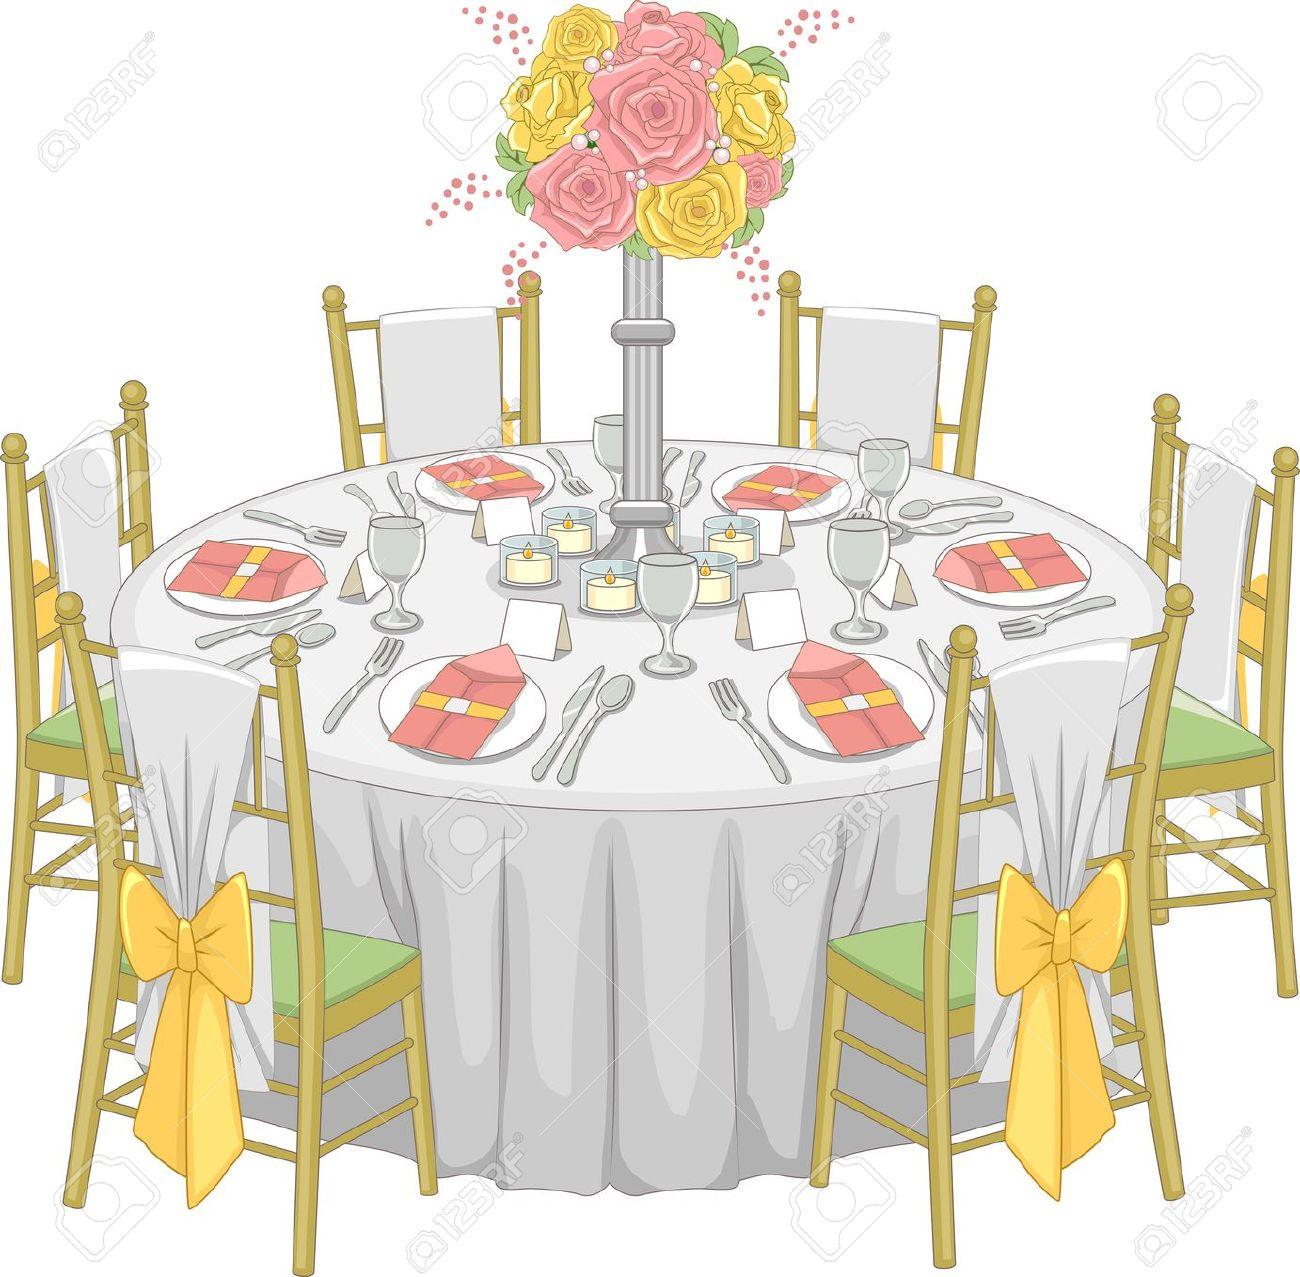 Wedding reception clipart picture transparent download Wedding Reception Table Clipart & Free Clip Art Images ... picture transparent download